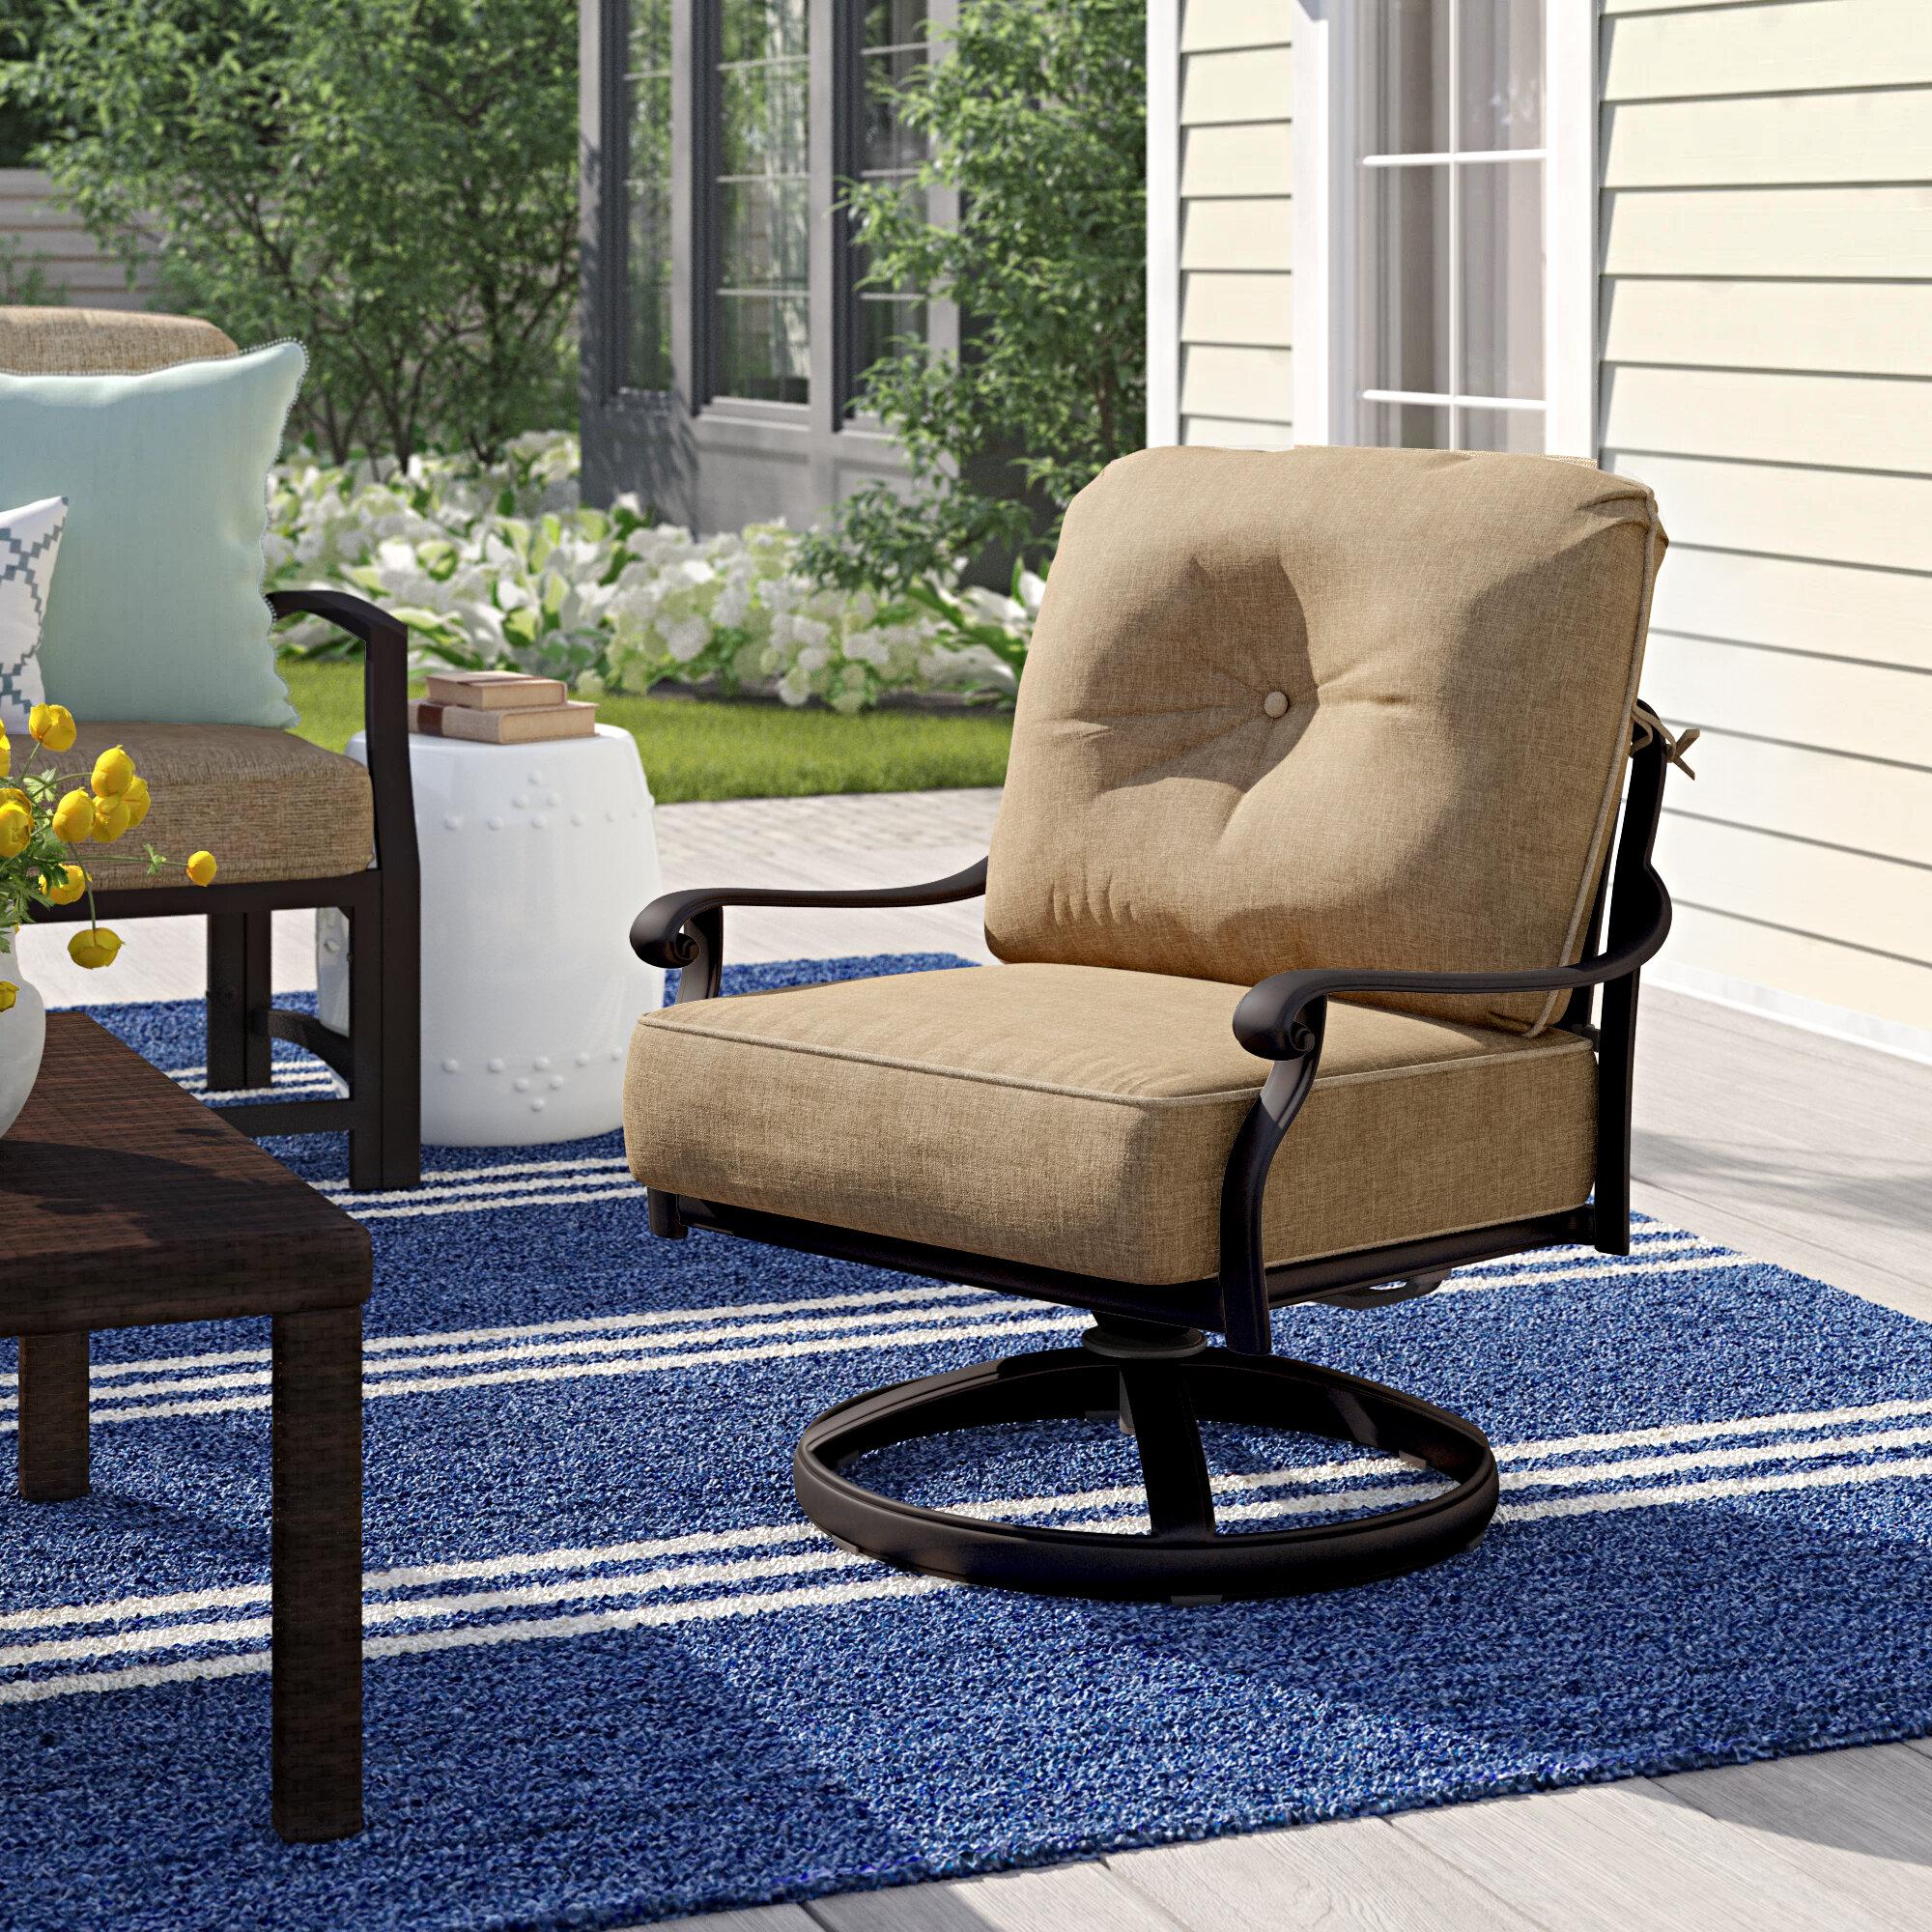 Astonishing Lebanon Rocker Swivel Recliner Patio Chair With Cushions Spiritservingveterans Wood Chair Design Ideas Spiritservingveteransorg